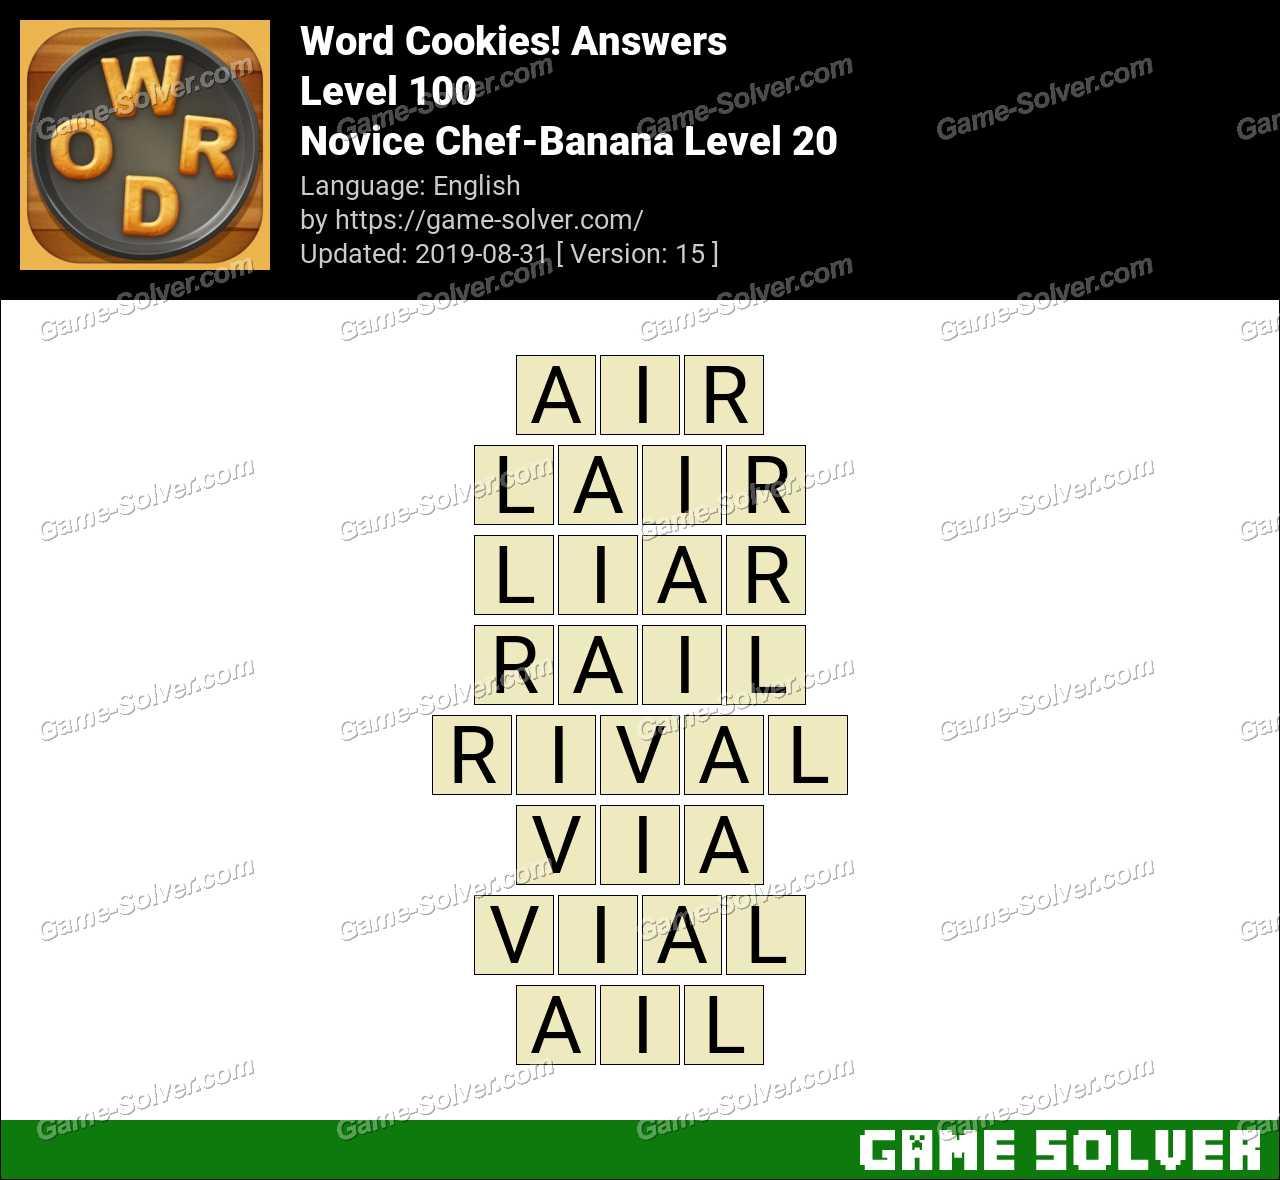 Word Cookies Novice Chef-Banana Level 20 Answers